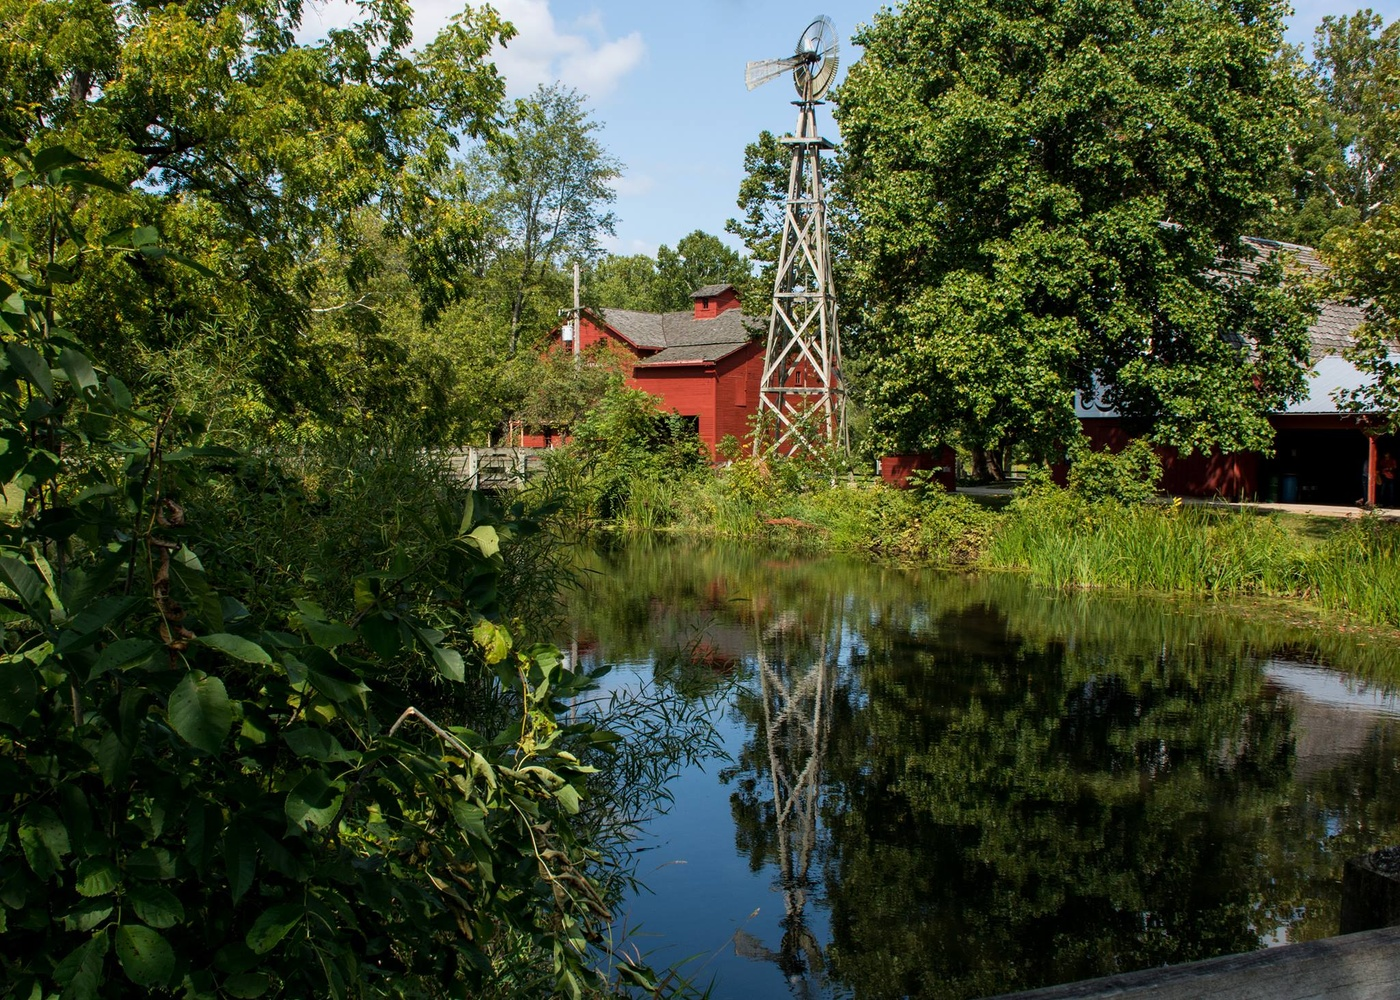 The Mill by Kathleen Horacek